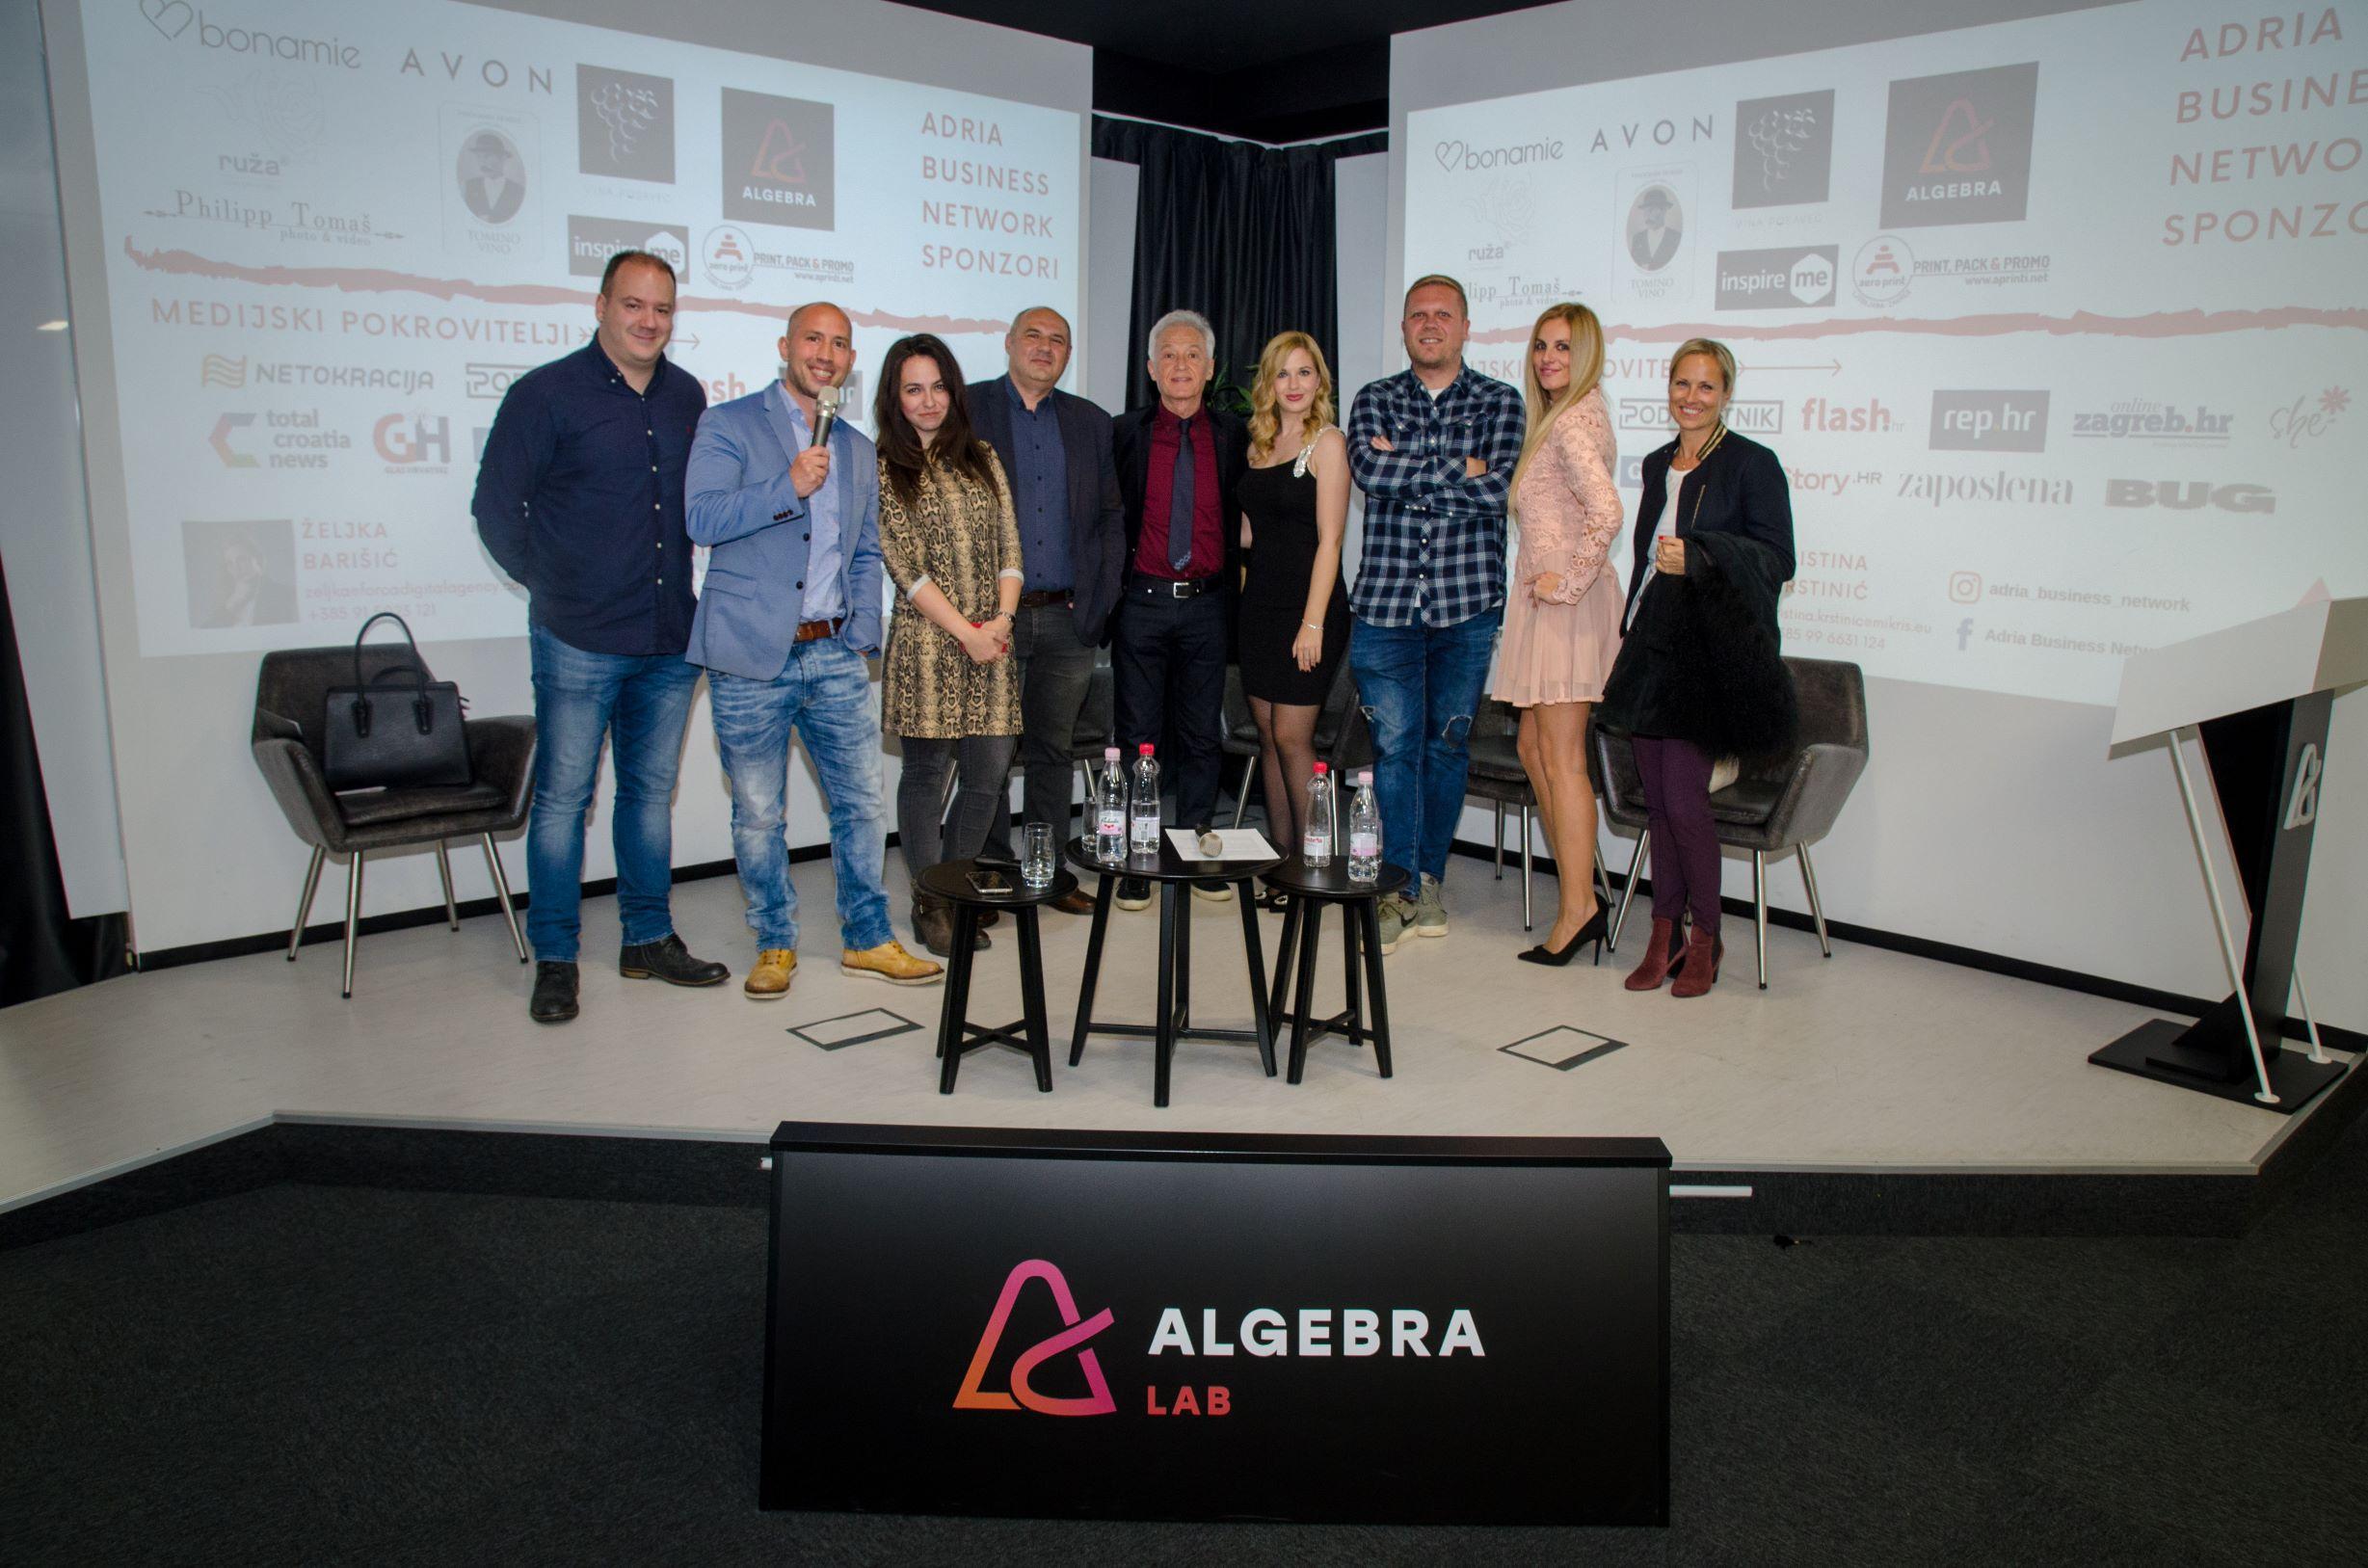 Održan drugi Adria Business Network